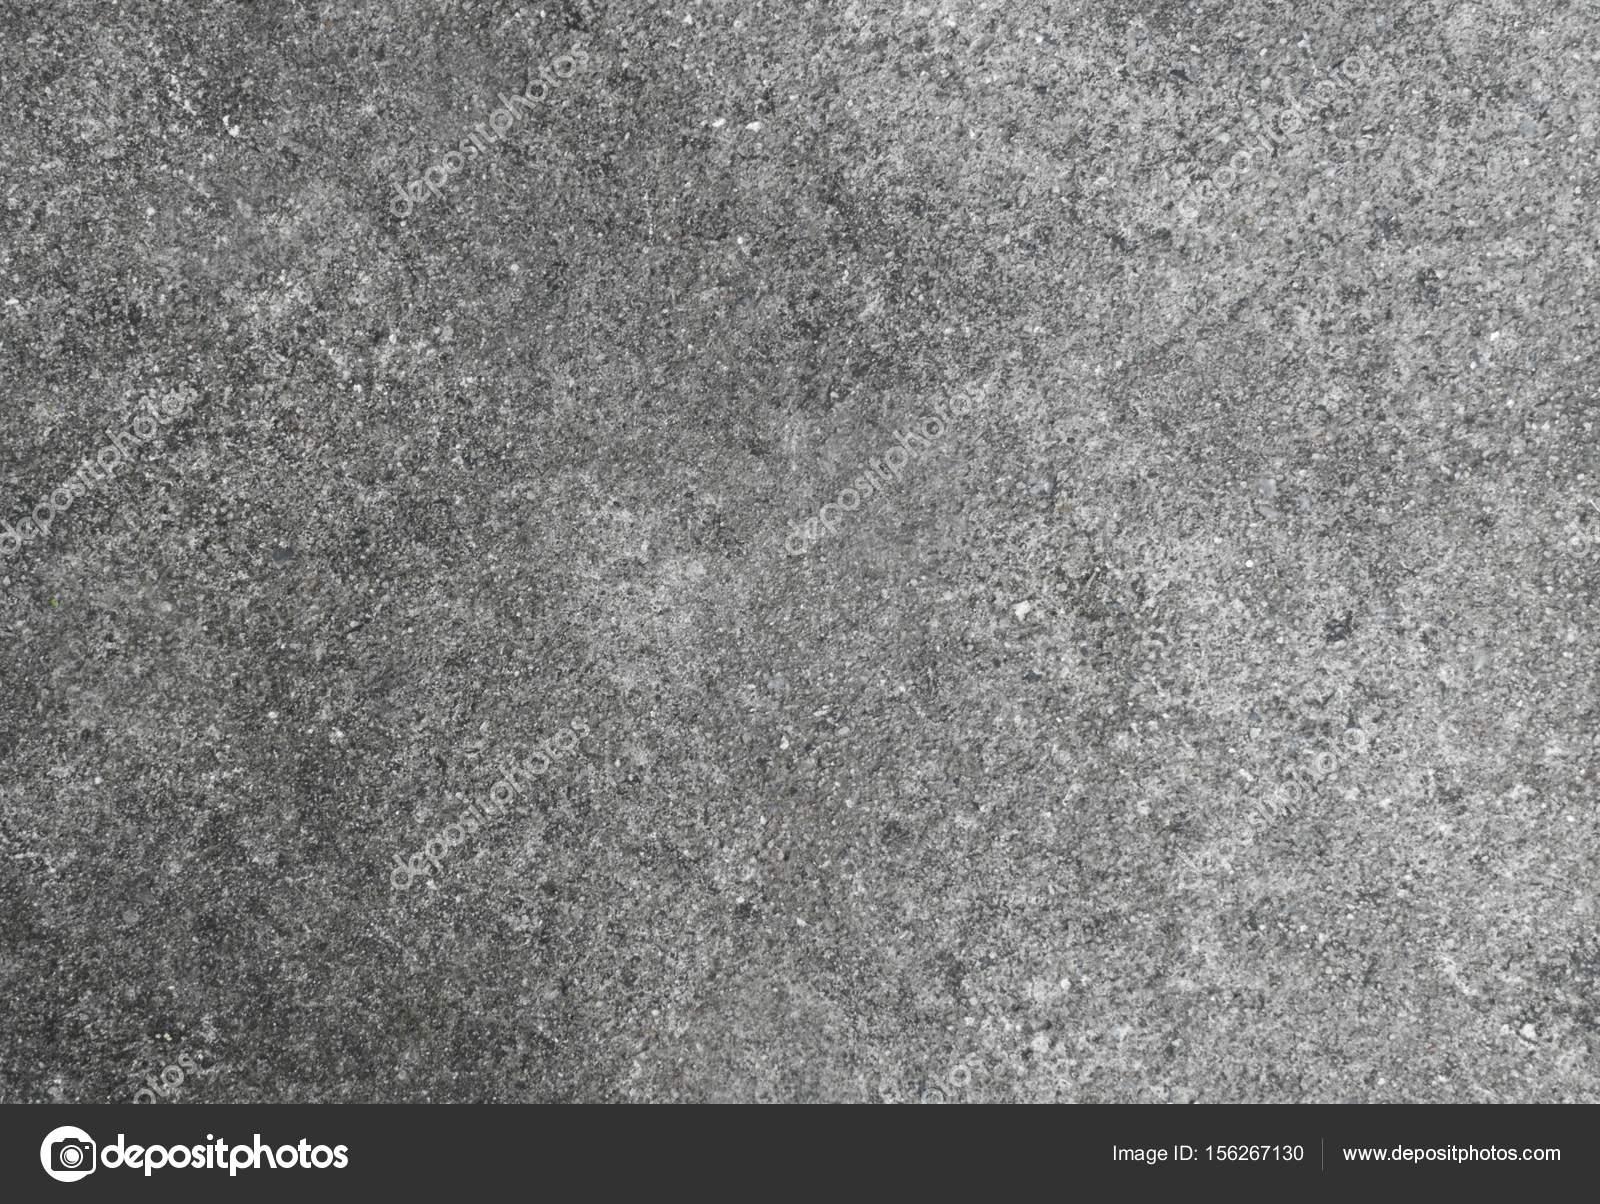 Horizontal Texture of Dark Grey Concrete Floor Background Stock